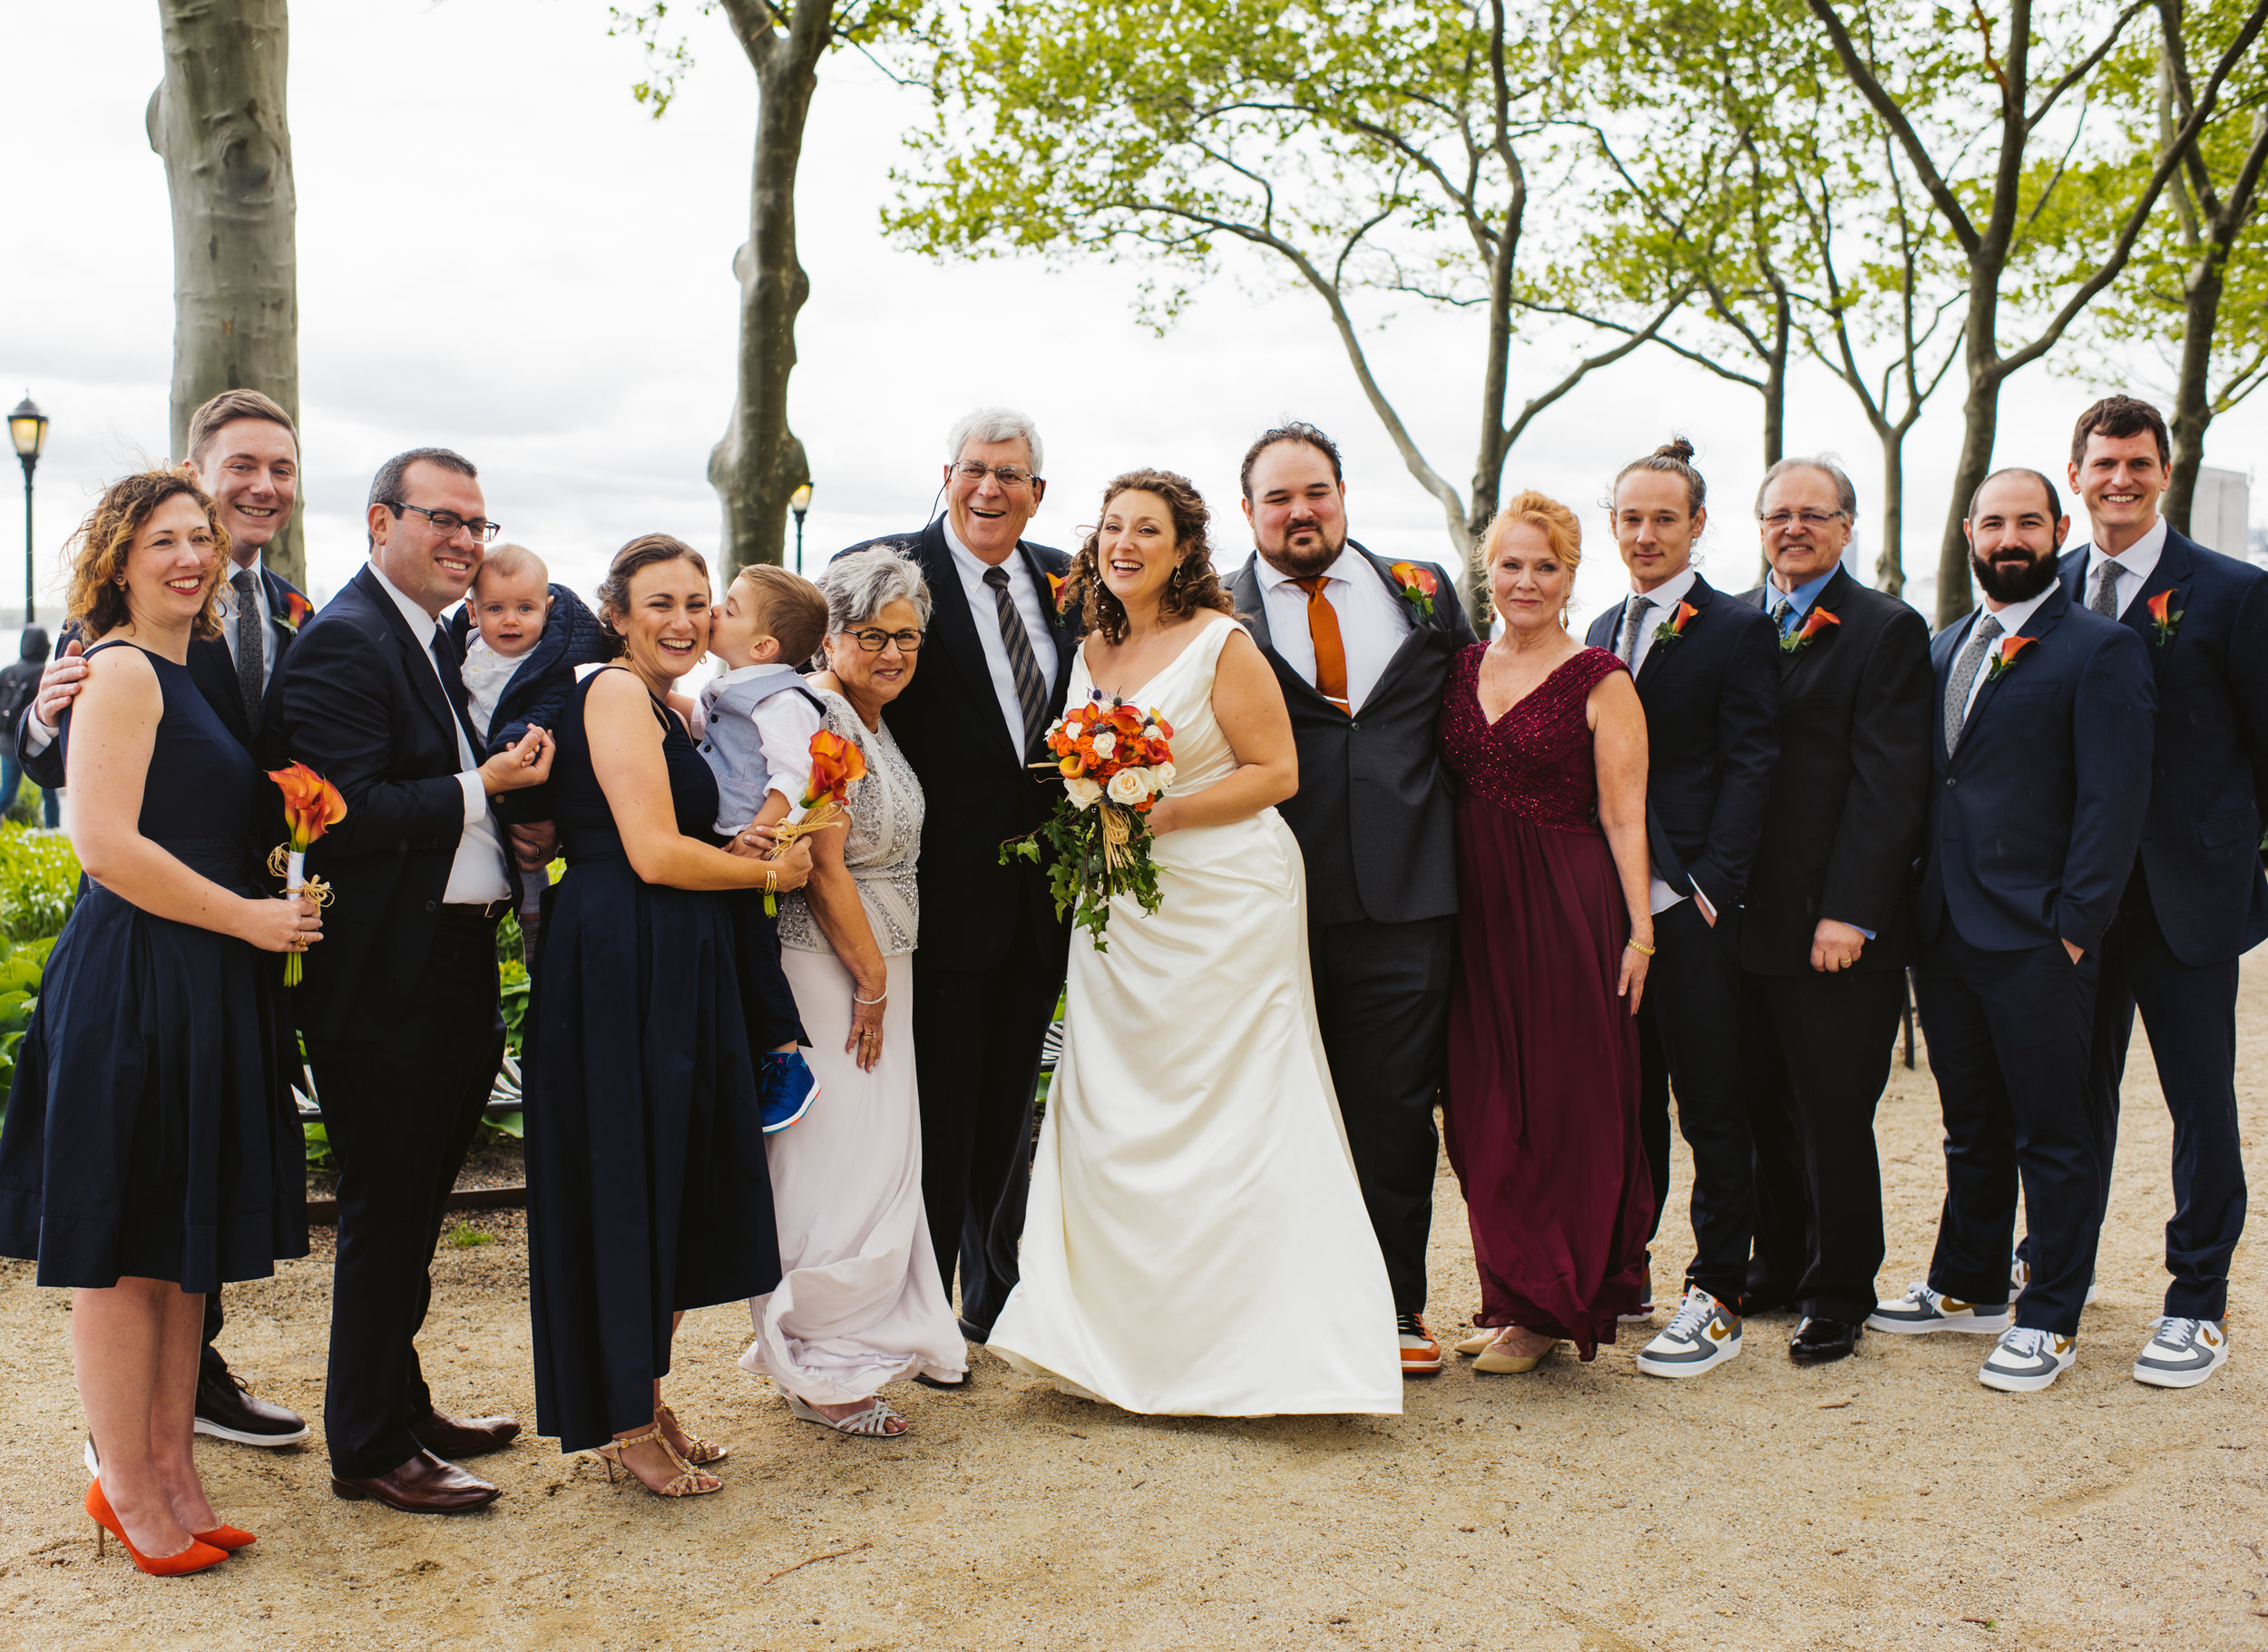 LIZA & JON - BATTERY PARK WEDDING - NYC INTIMATE WEDDING PHOTOGRAPHER - CHI-CHI AGBIM-234.jpg